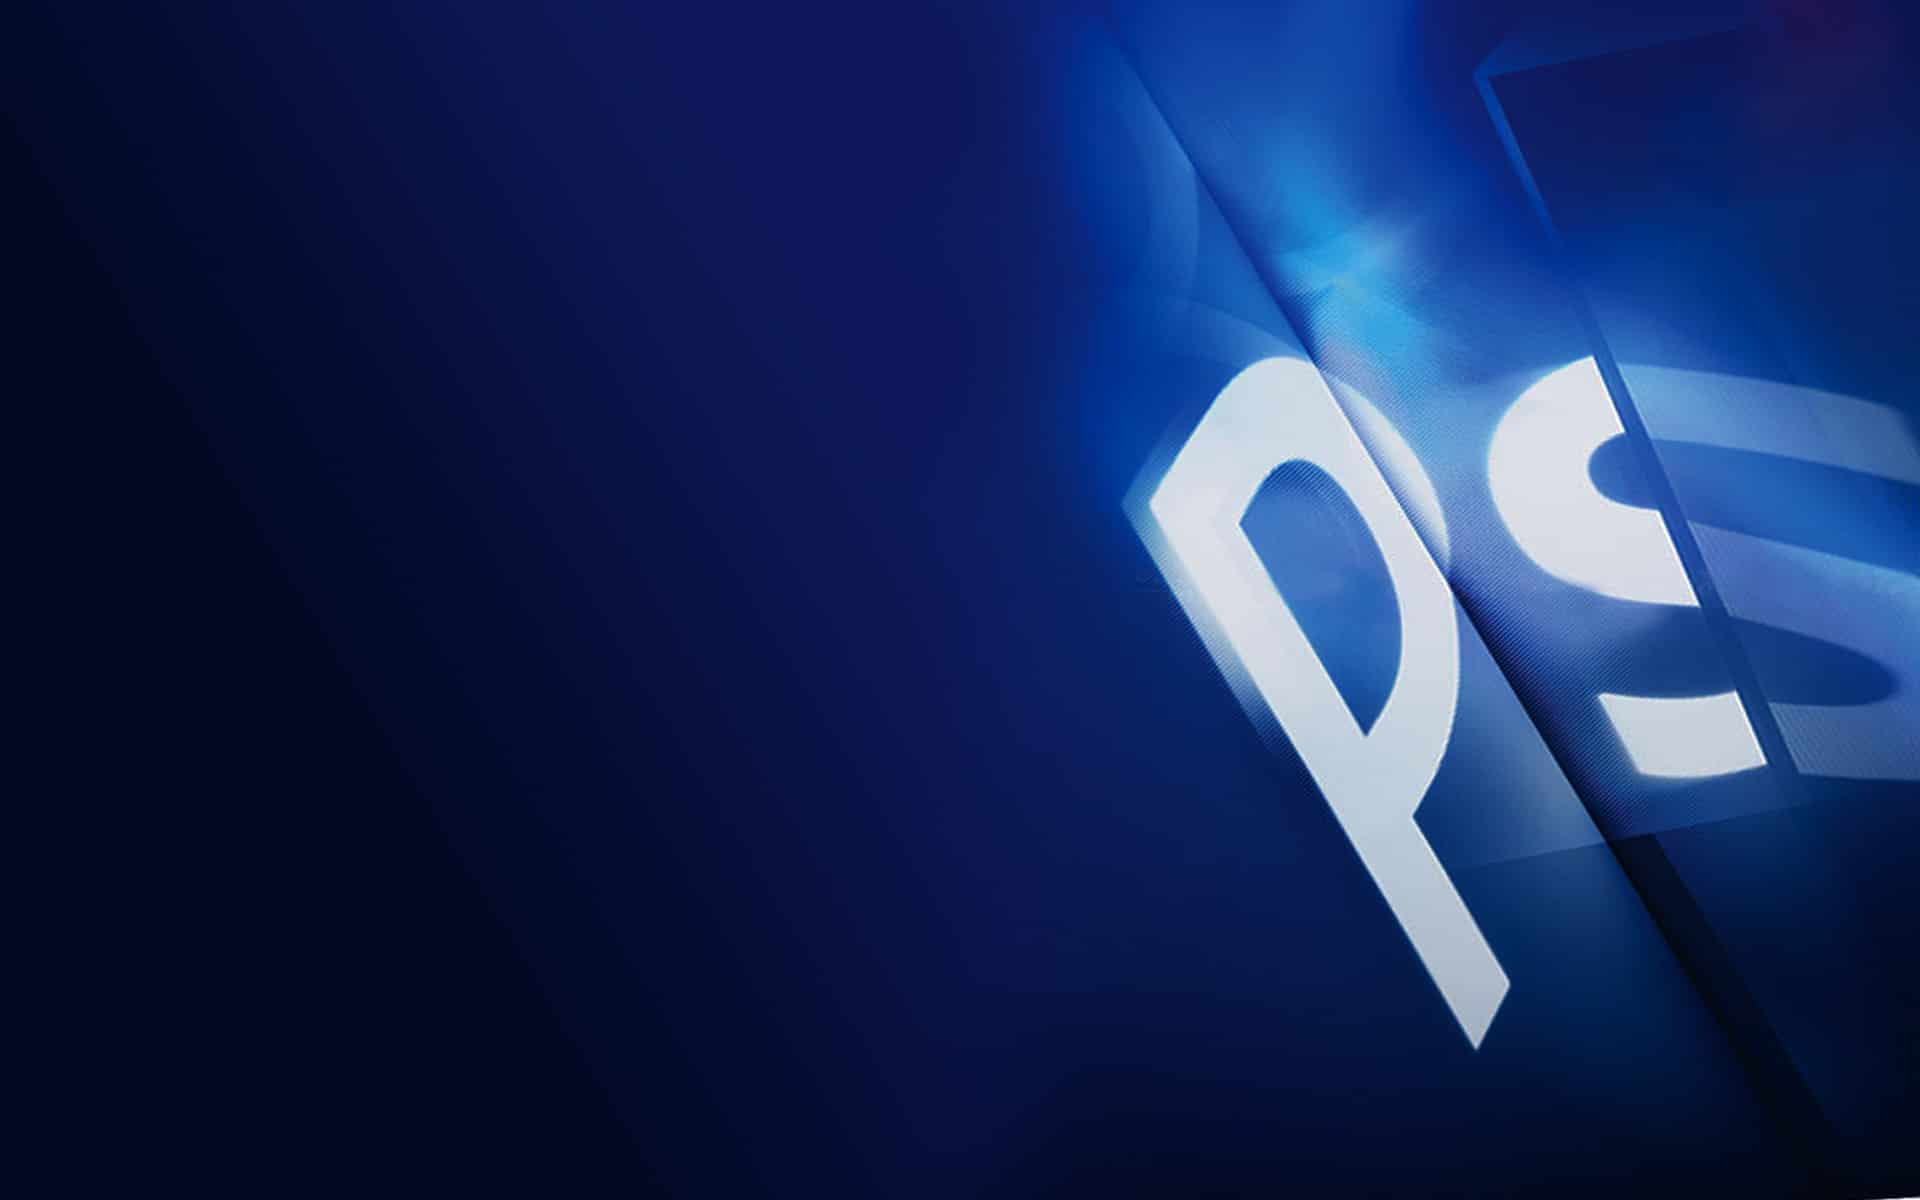 Adobe-Photoshop-Cs5-Wide-Screen-Desktop-Wallpaper